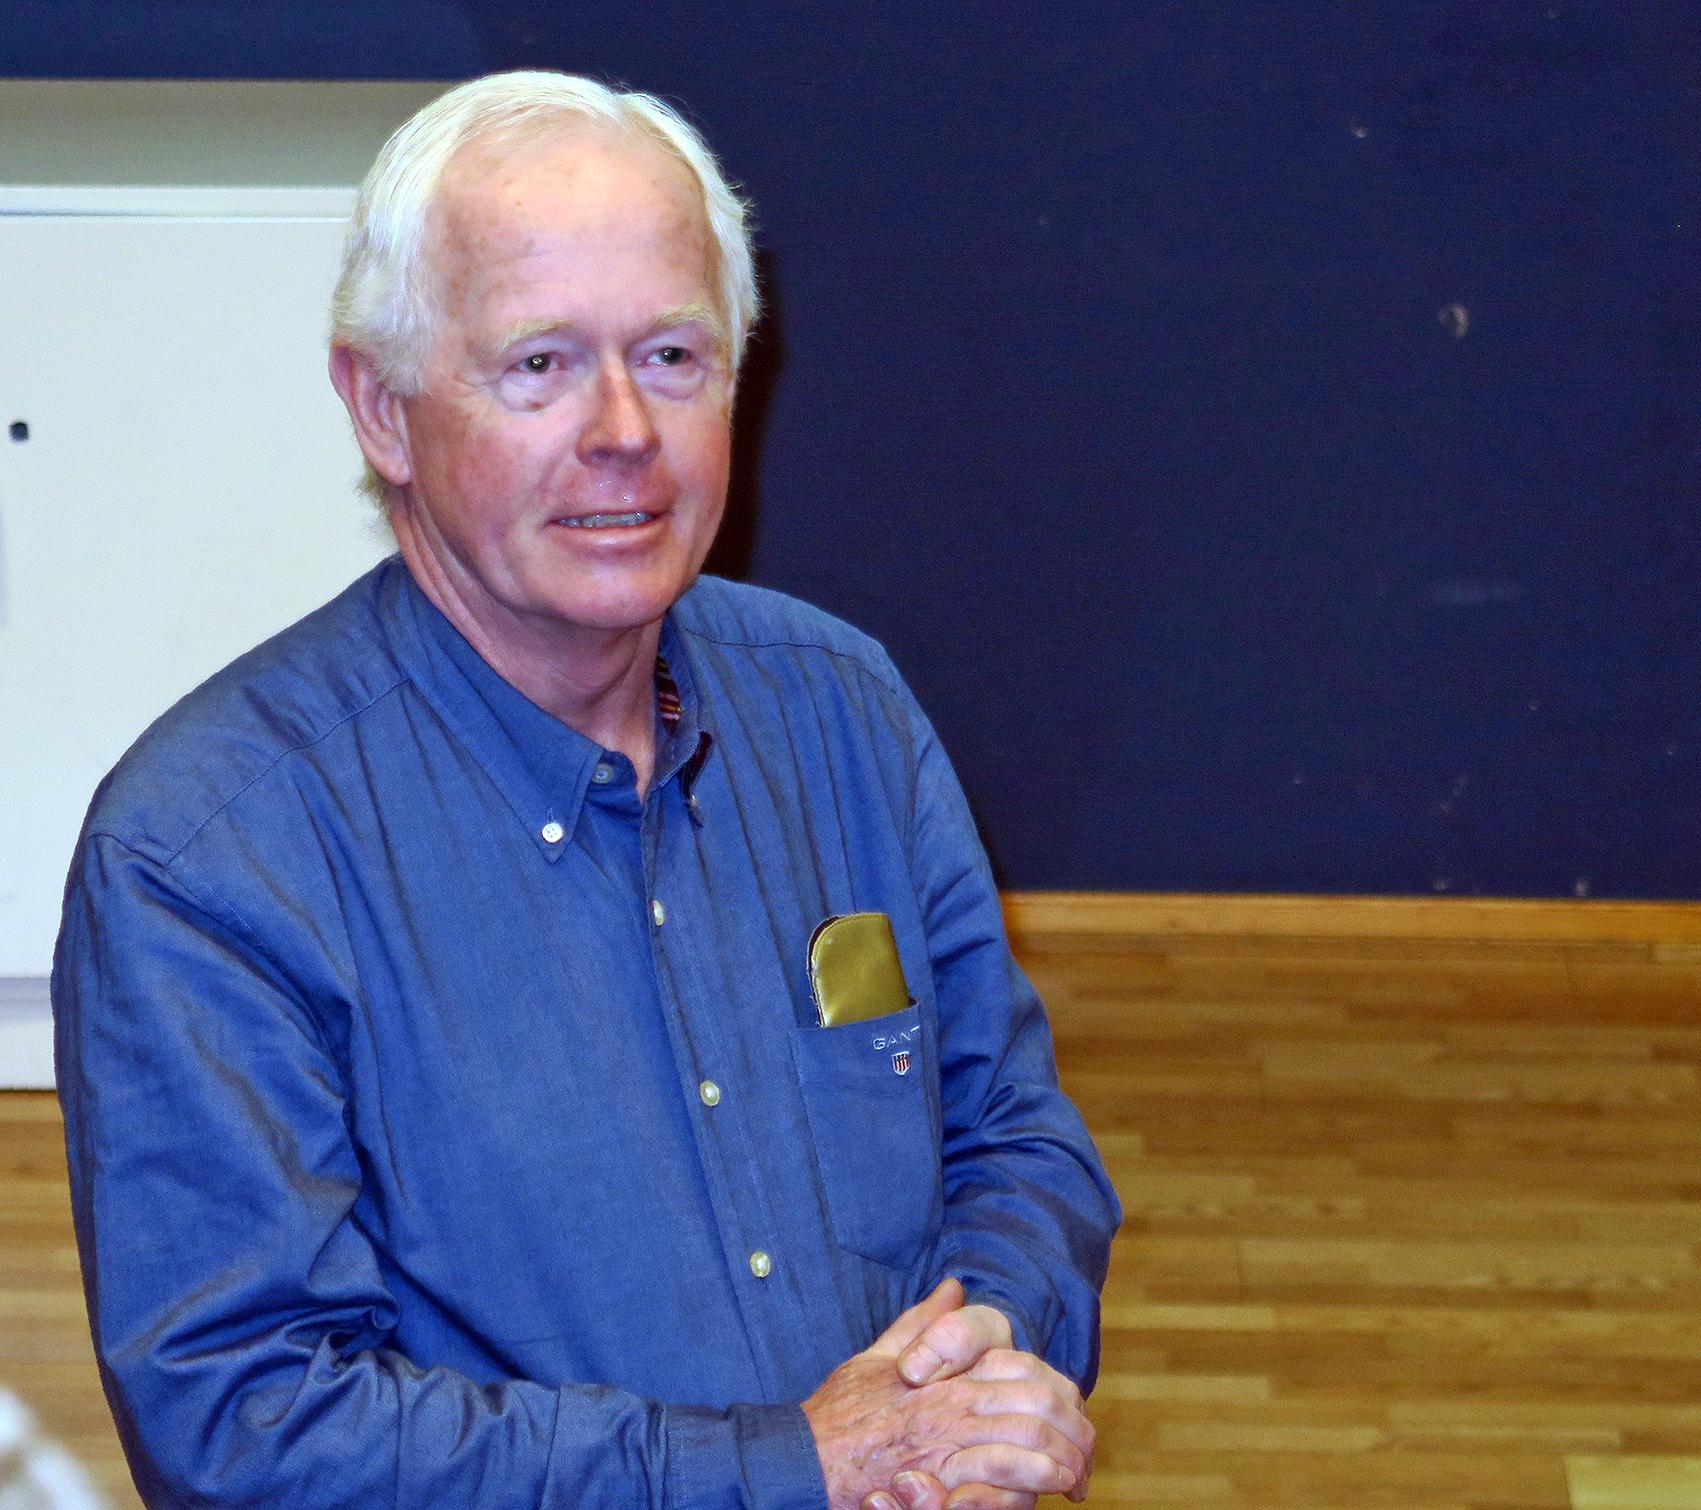 Henning Ø. Poulsson leder Hardangervidda villreinutval for perioden 2016-2020. Lørdag ledet han halvårsmøtet på en utmerket måte. Foto: A. Nyaas